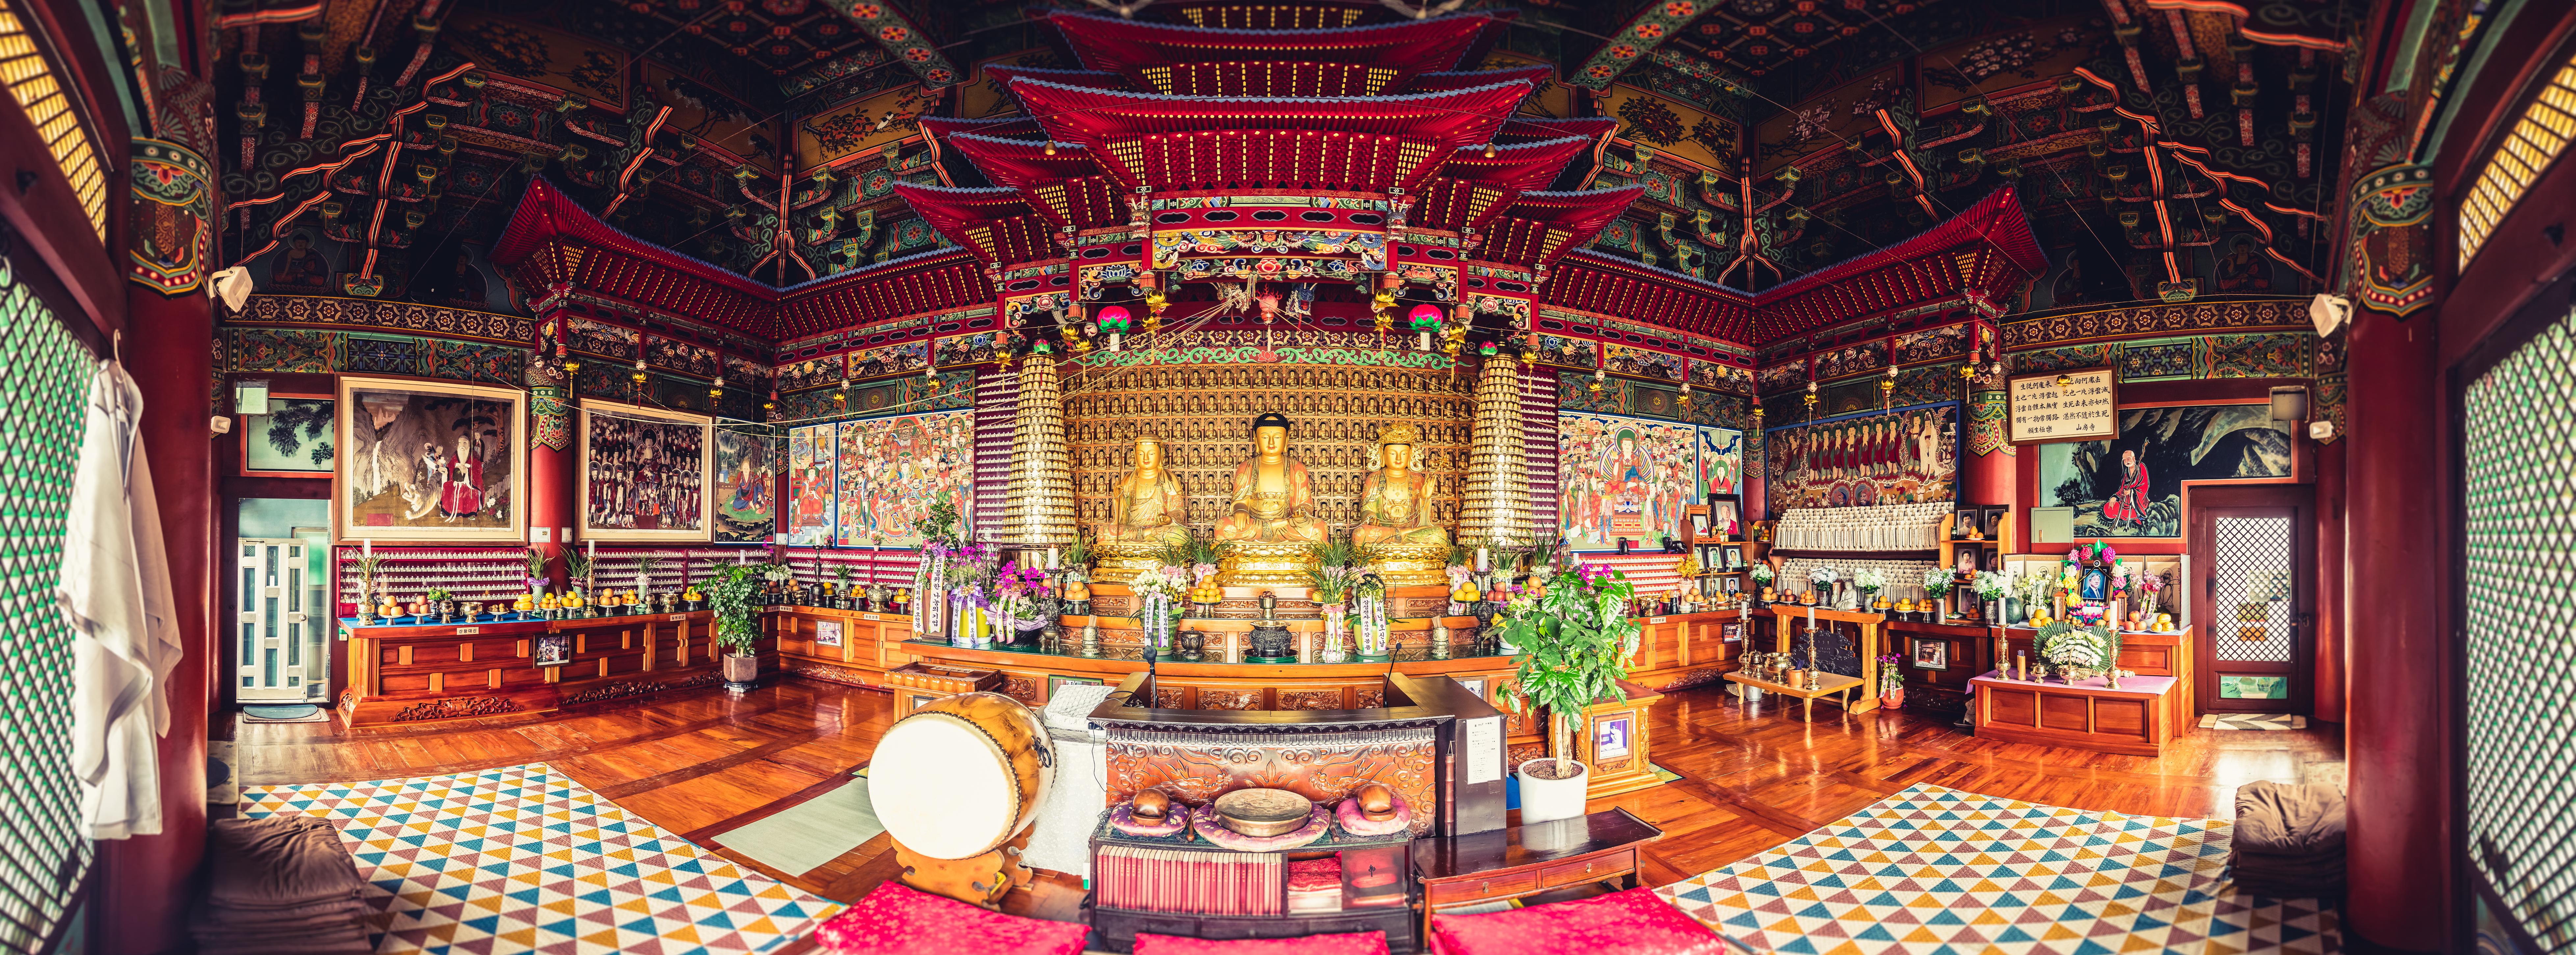 Buddhistischer Tempel Sangbagsan